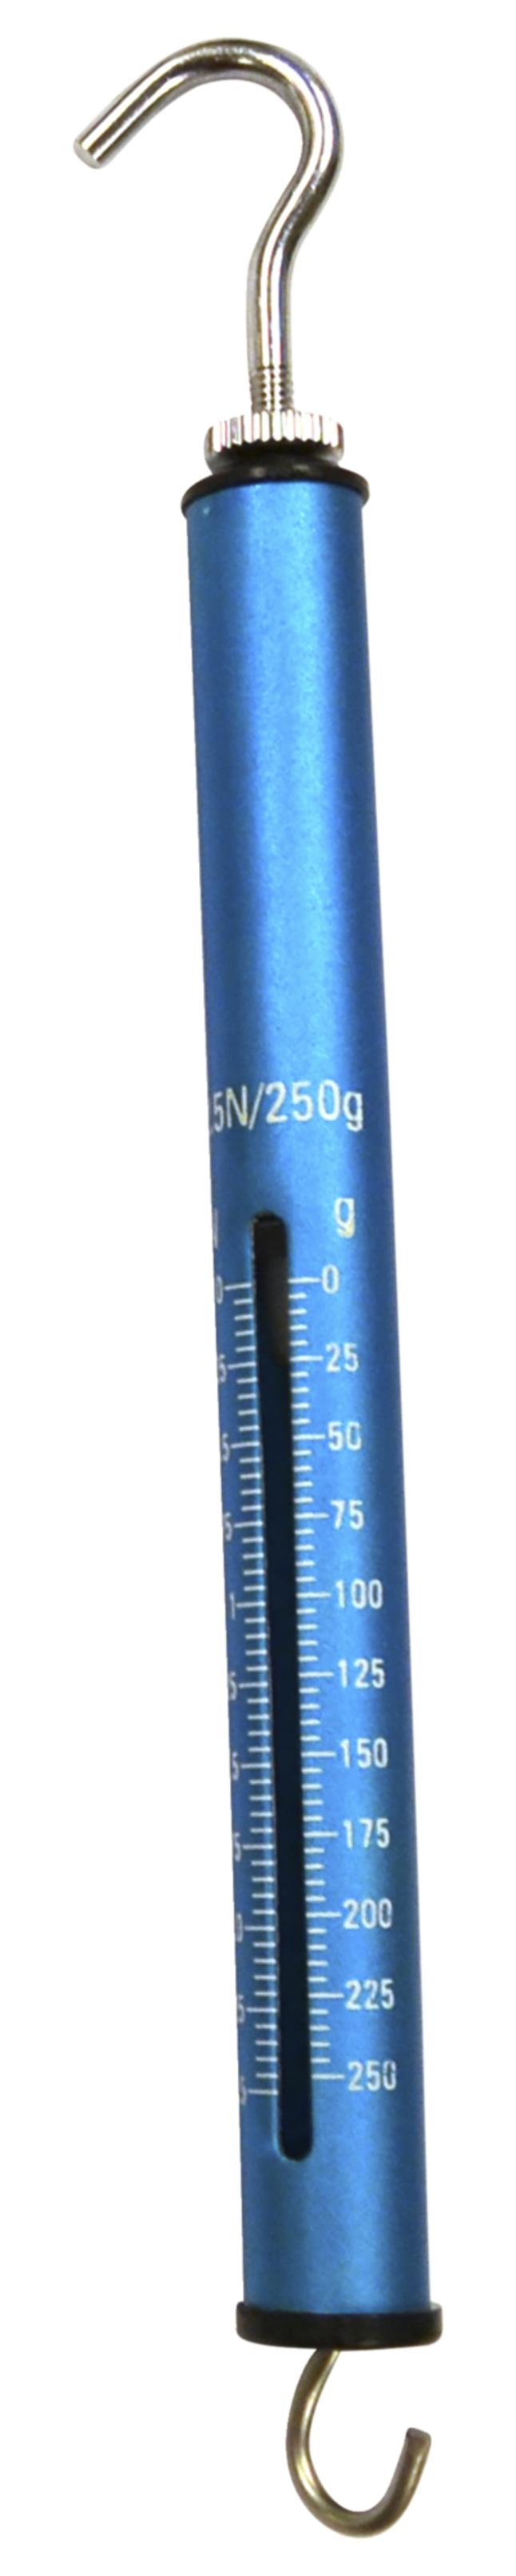 Spring Scales, Item Number 2022576